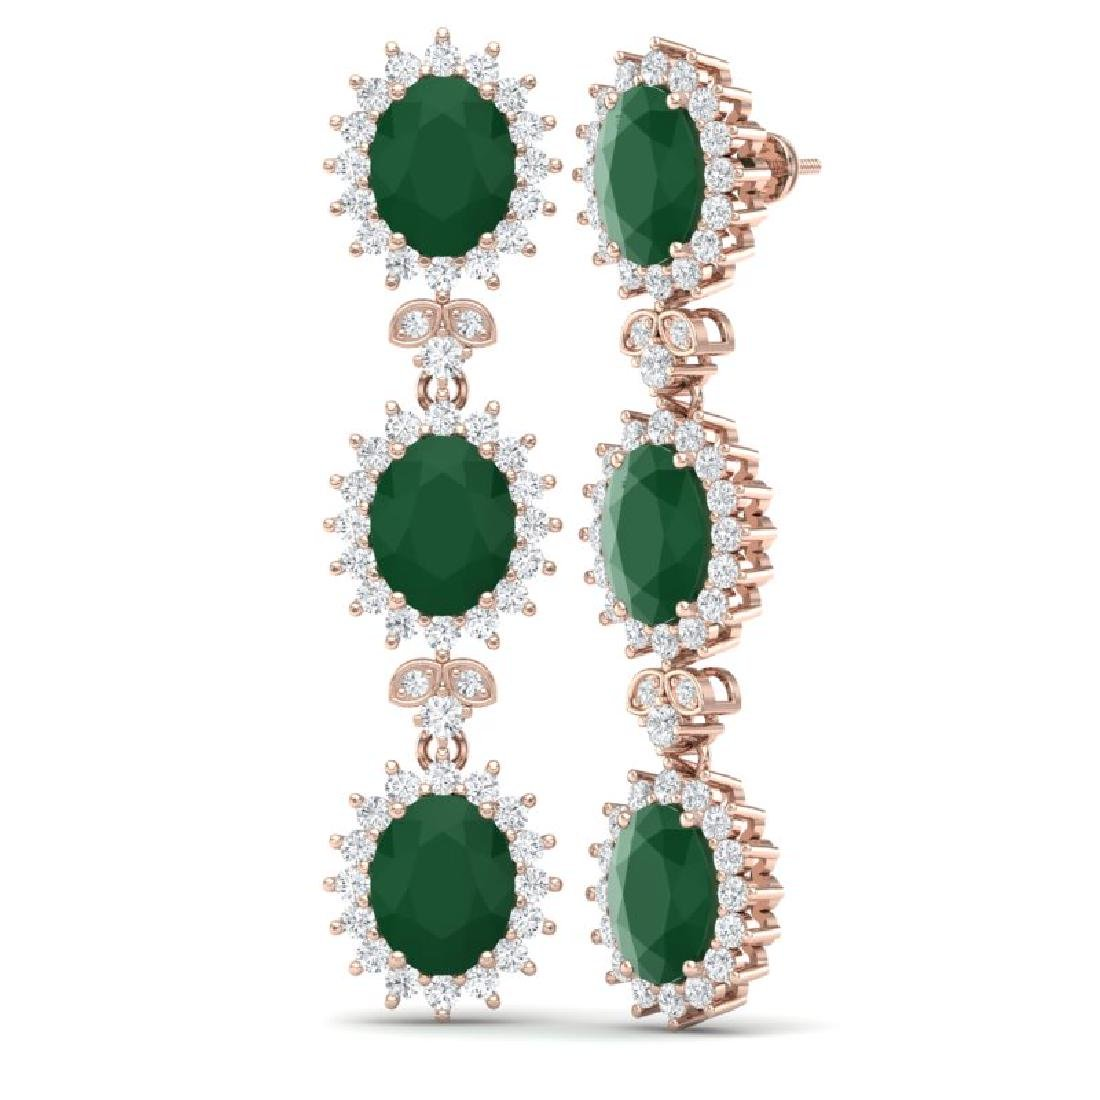 24.52 CTW Royalty Emerald & VS Diamond Earrings 18K - 2